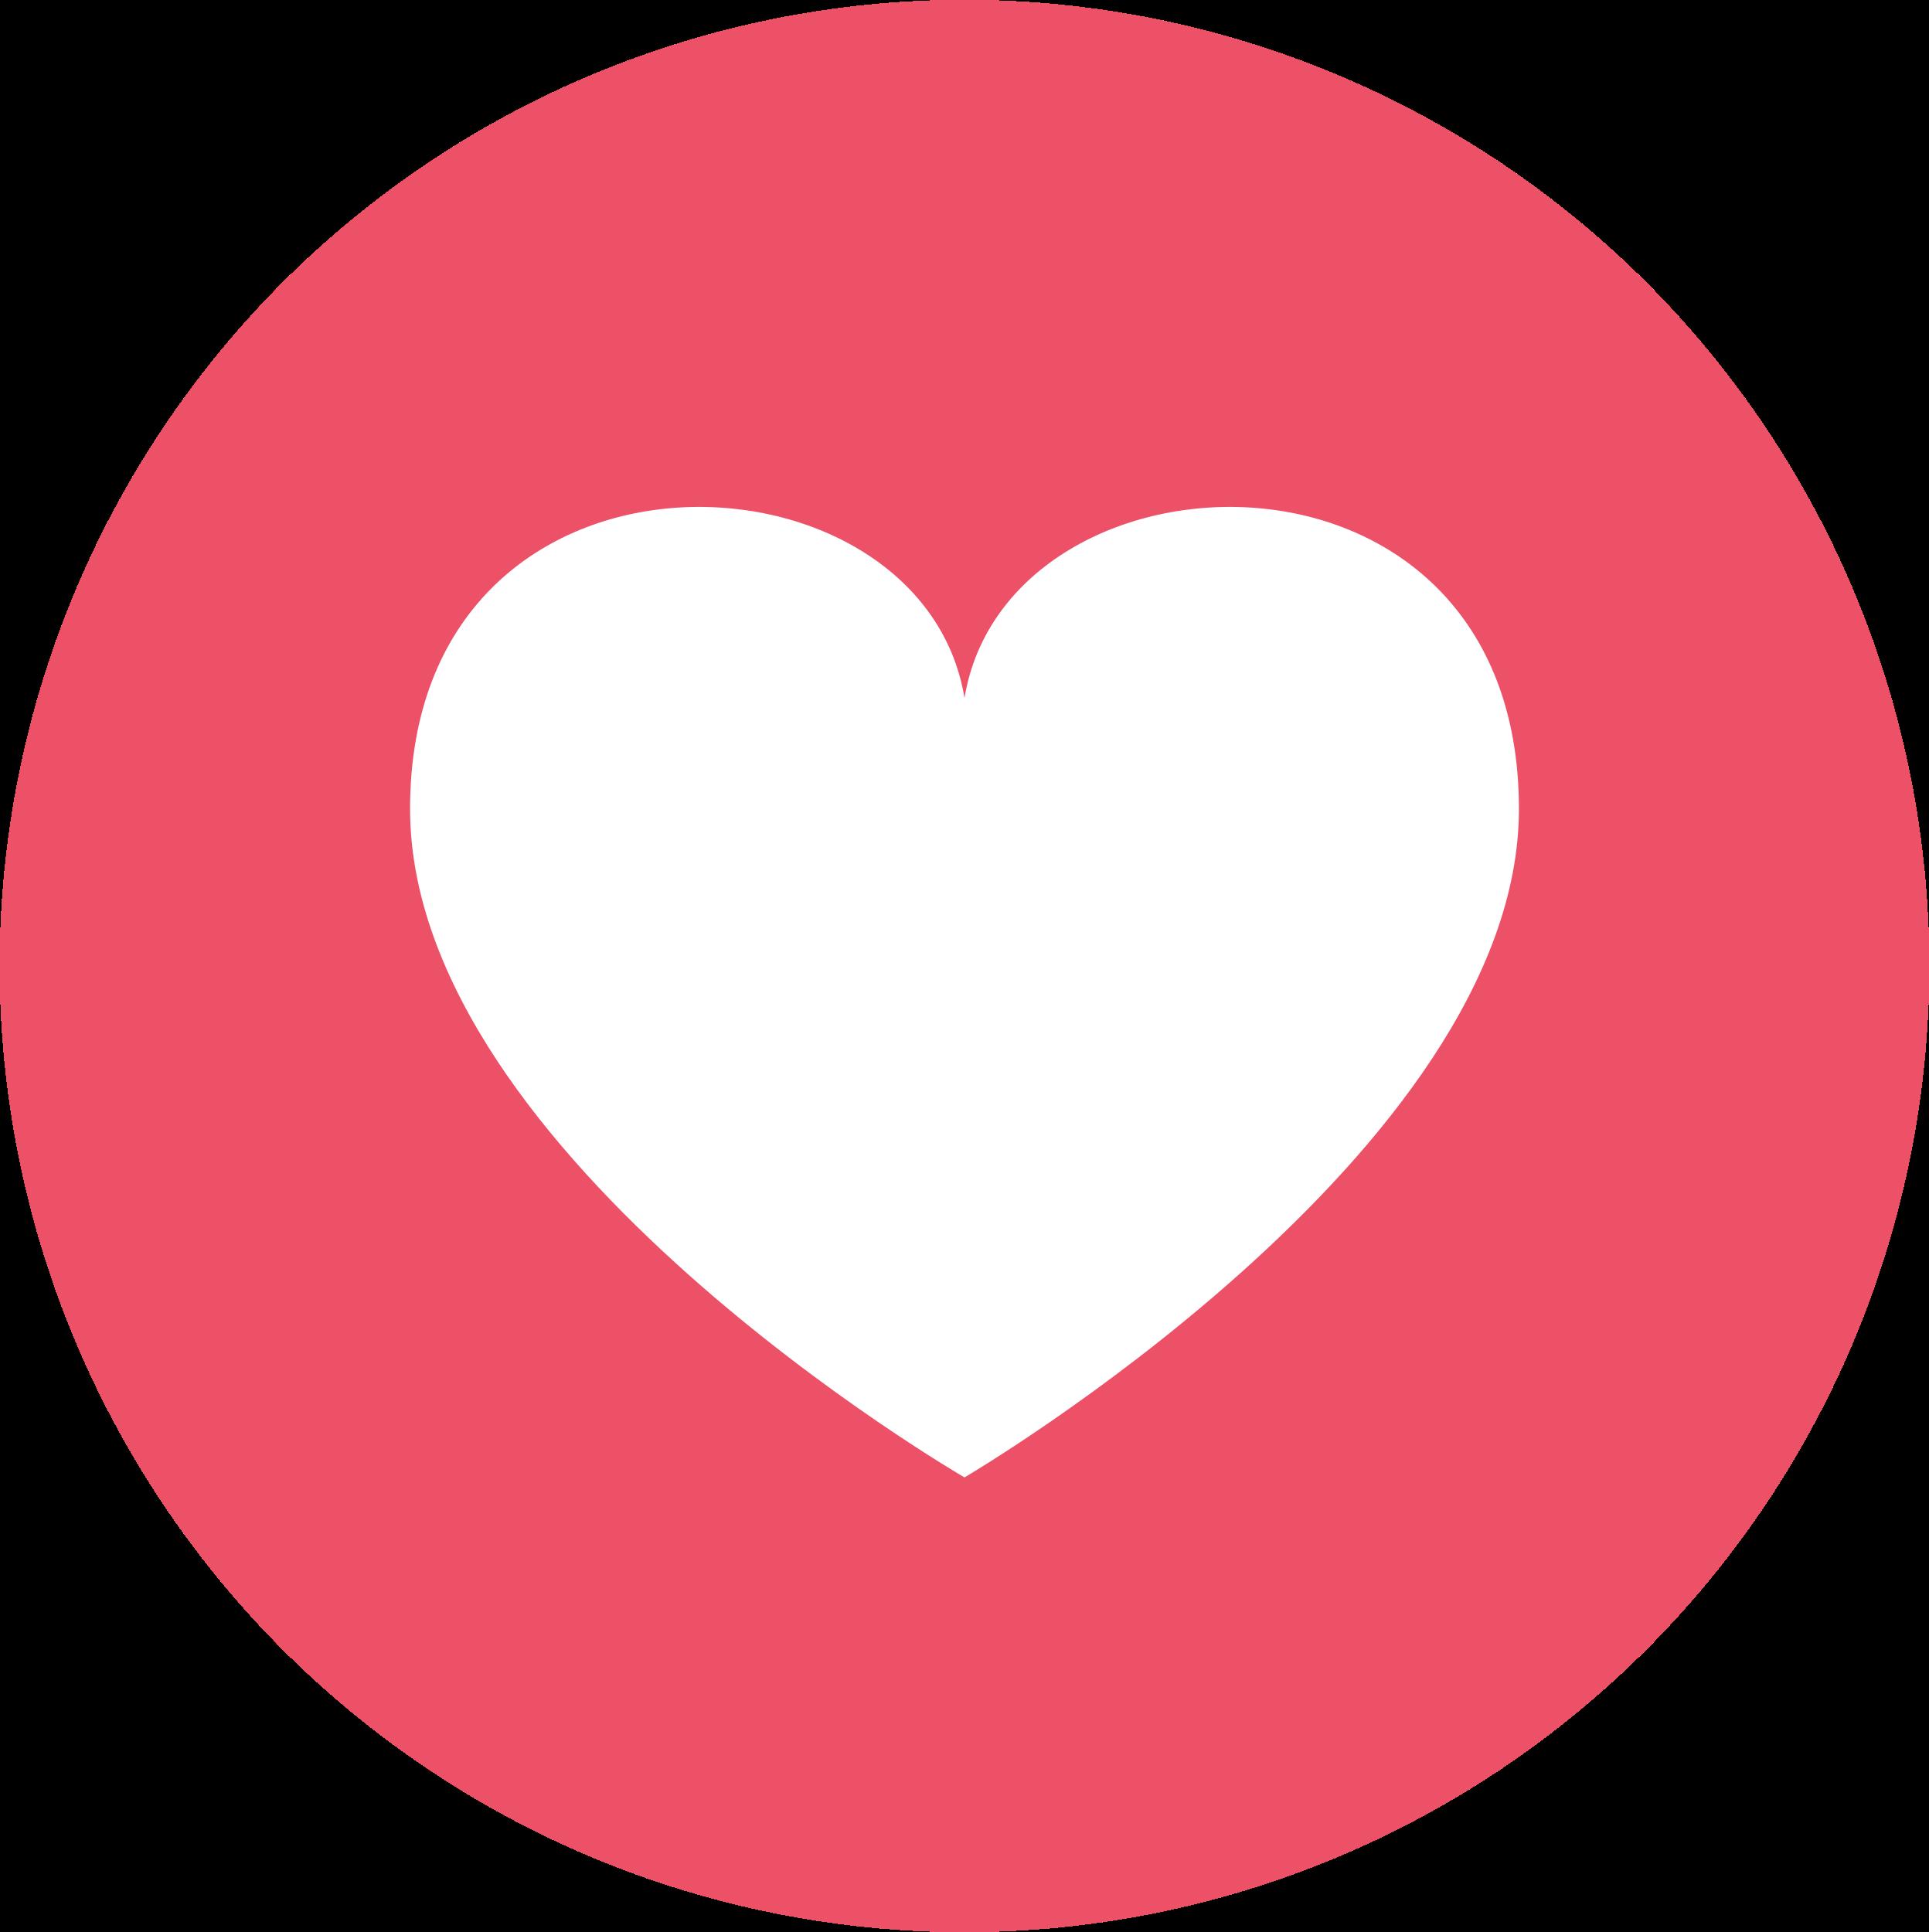 Love emoji like png facebook love emoji like png biocorpaavc Choice Image